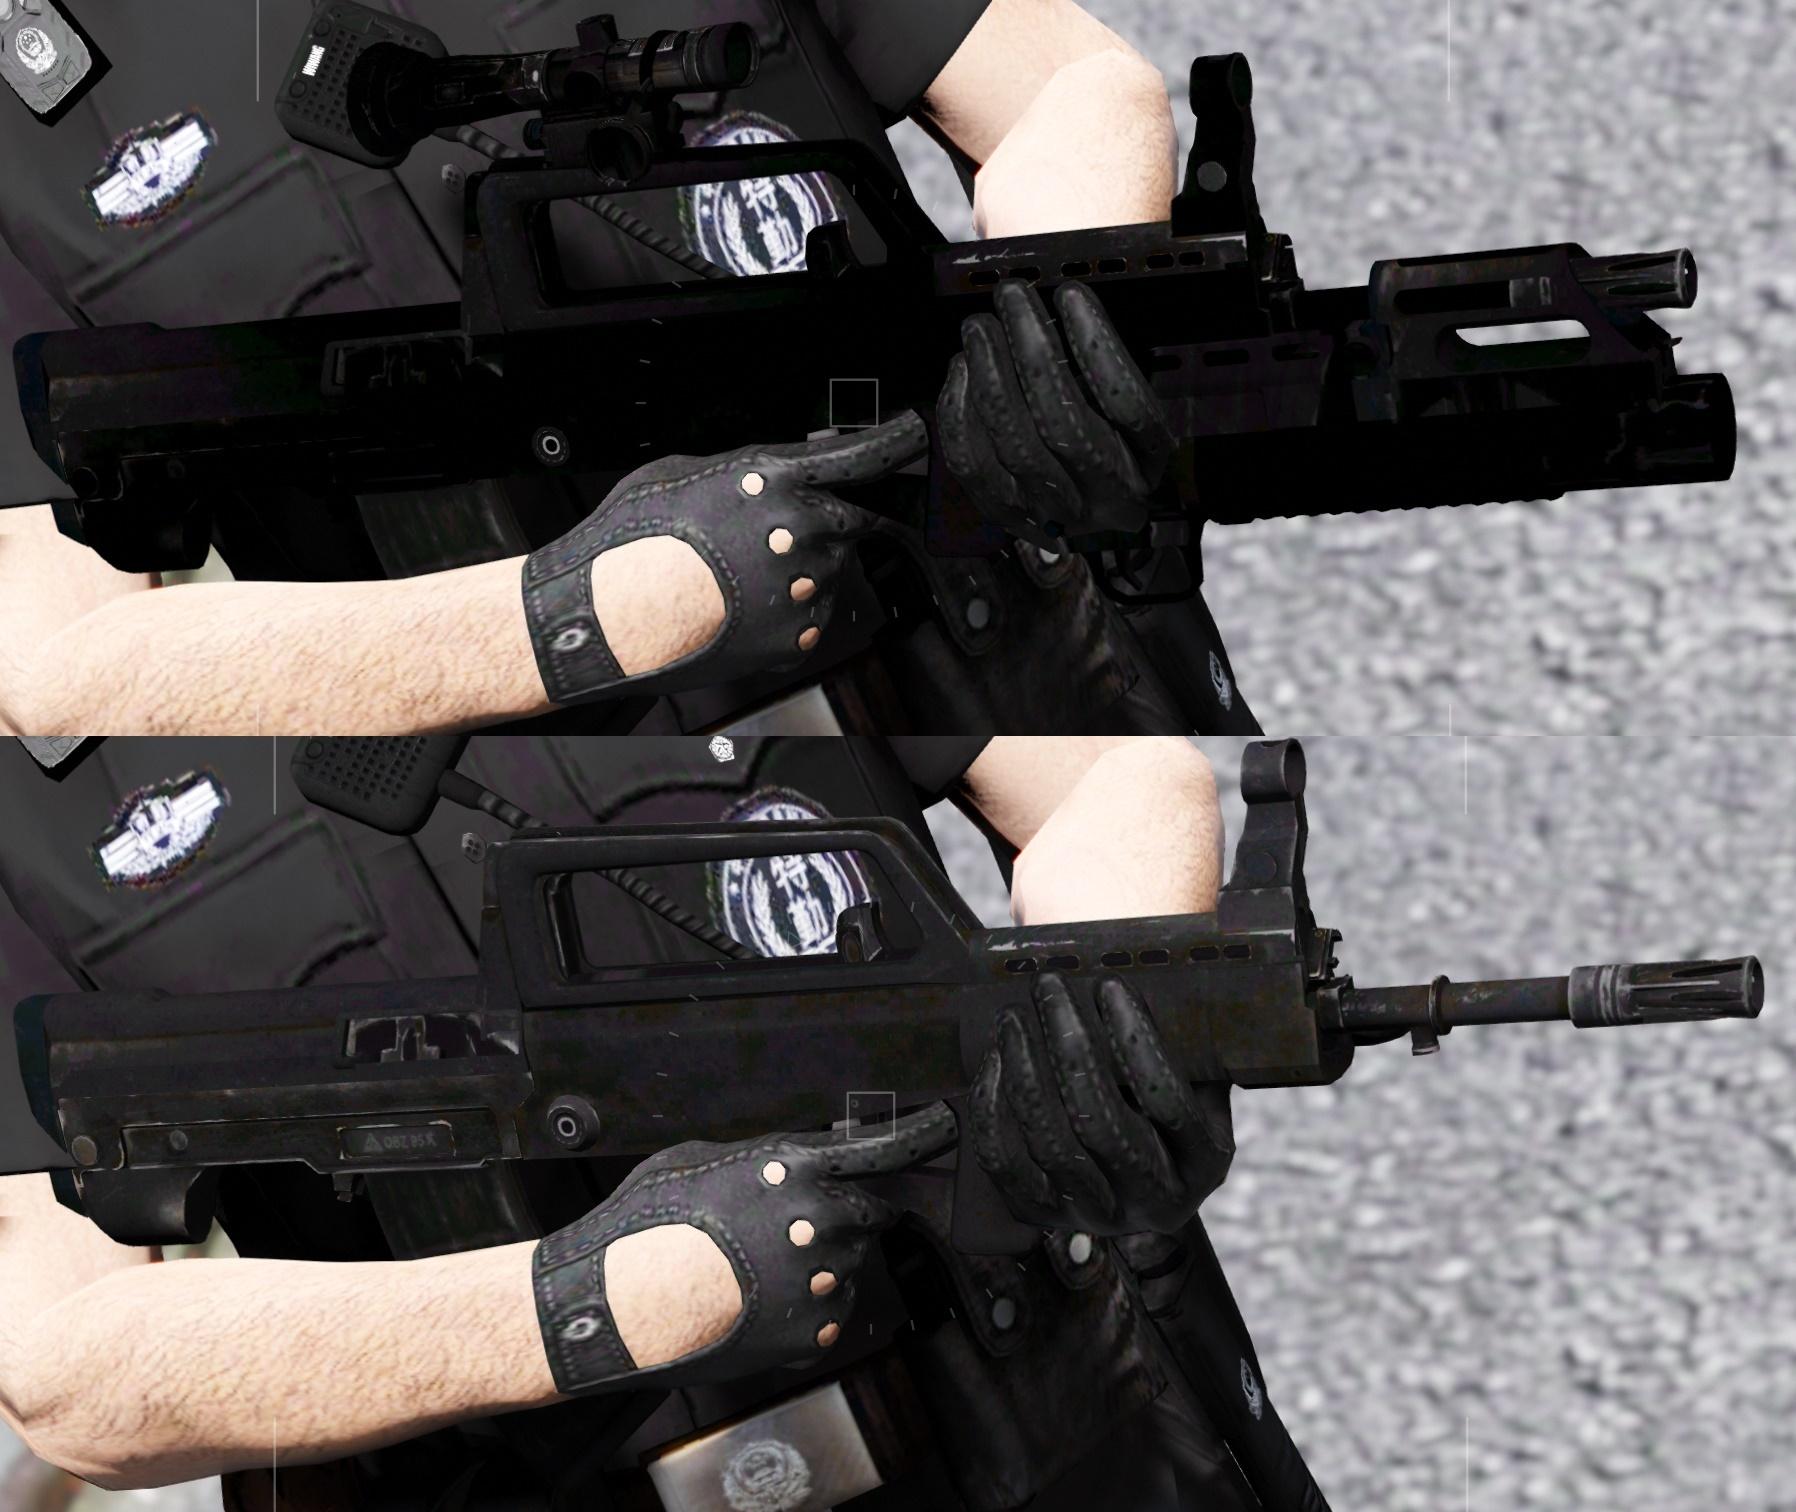 QBZ-95 Weapon